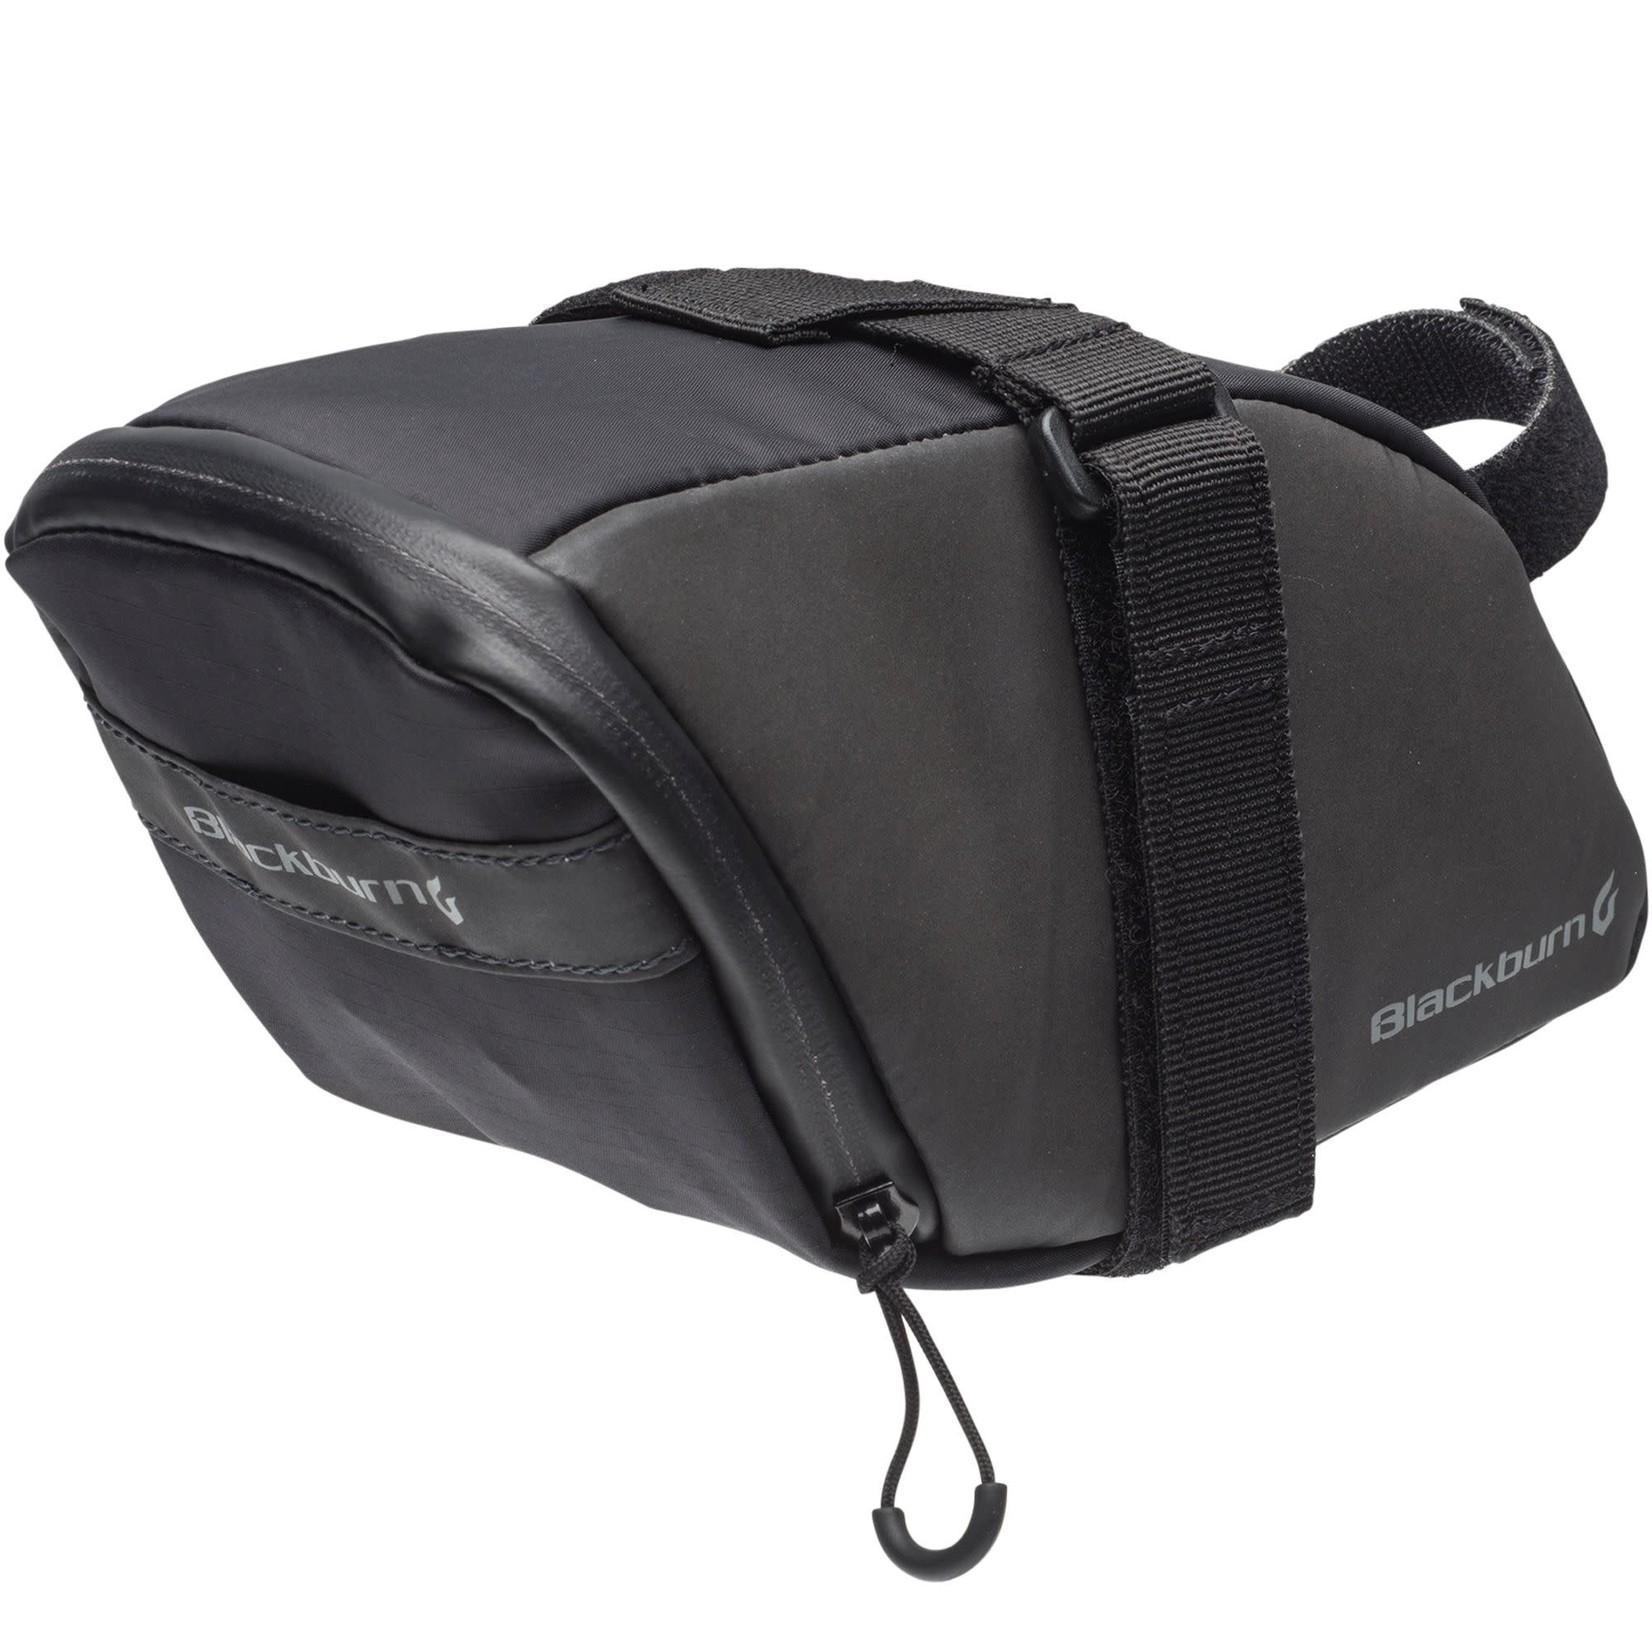 Blackburn Grid Large Seat Bag - Black